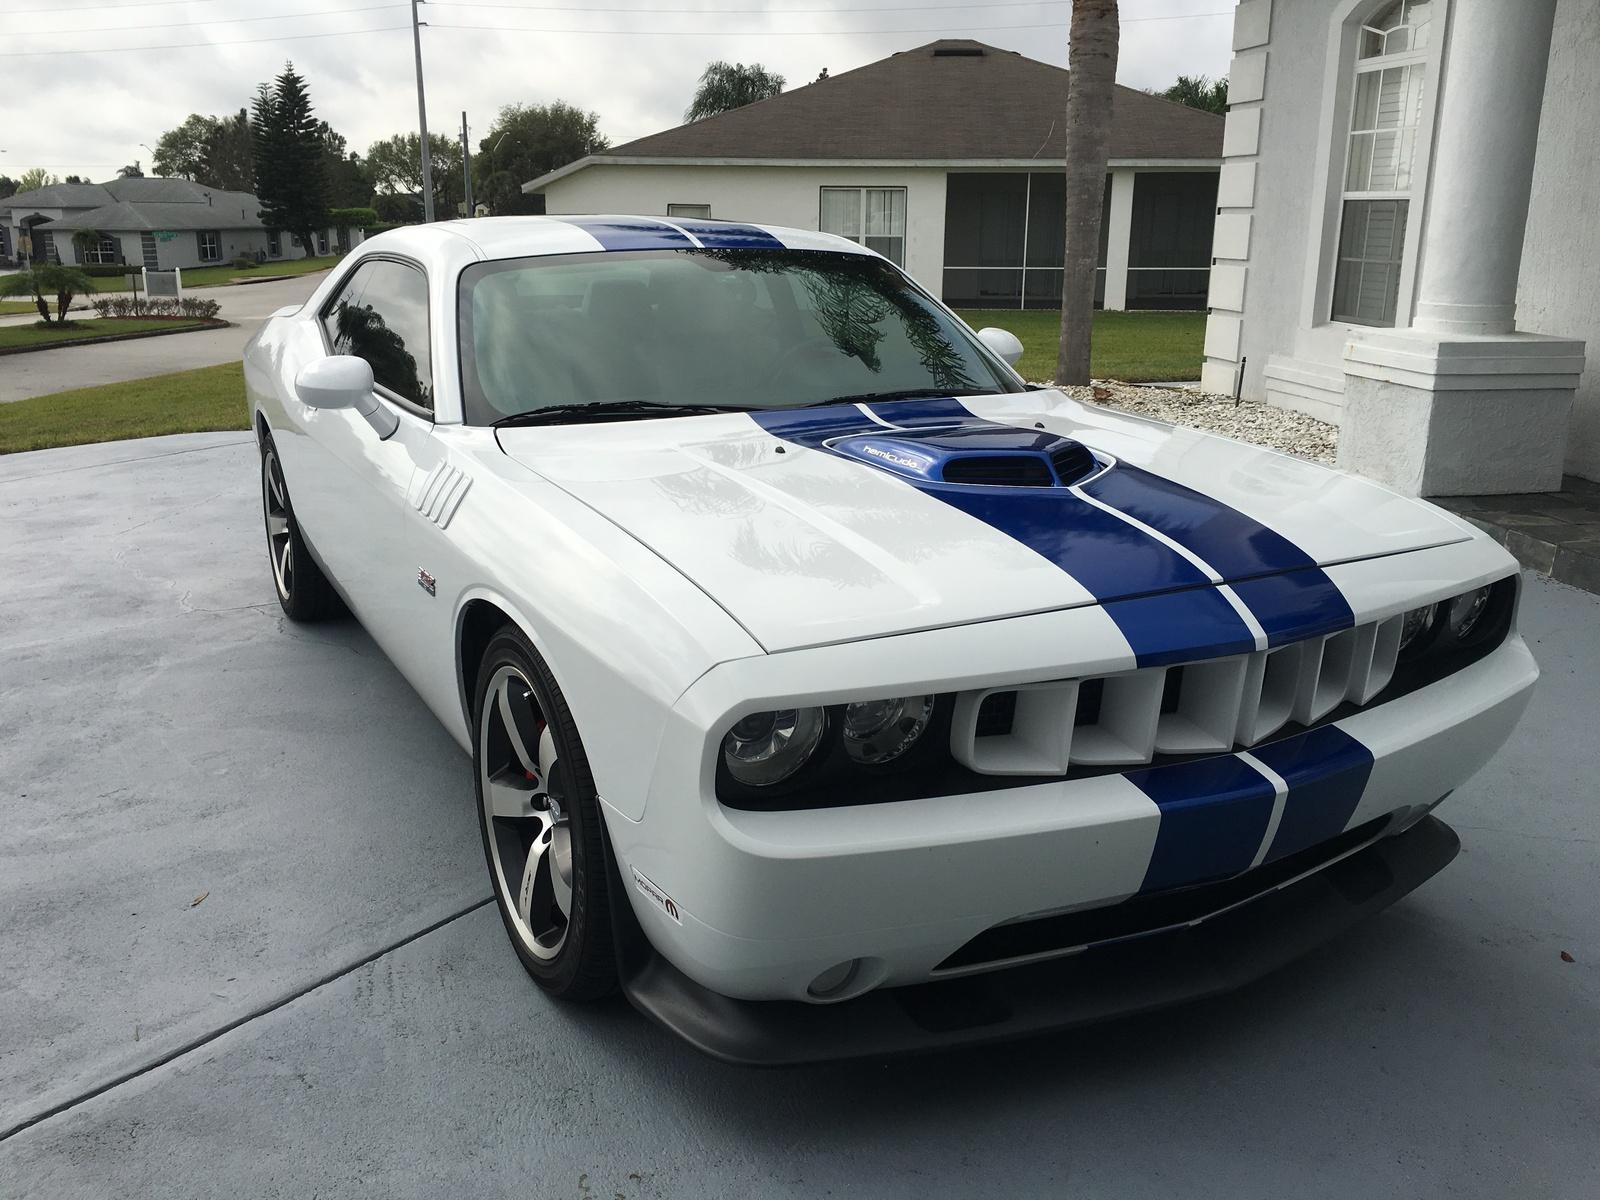 Dodge Challenger Questions - how do i get a fair appraisal on a ...